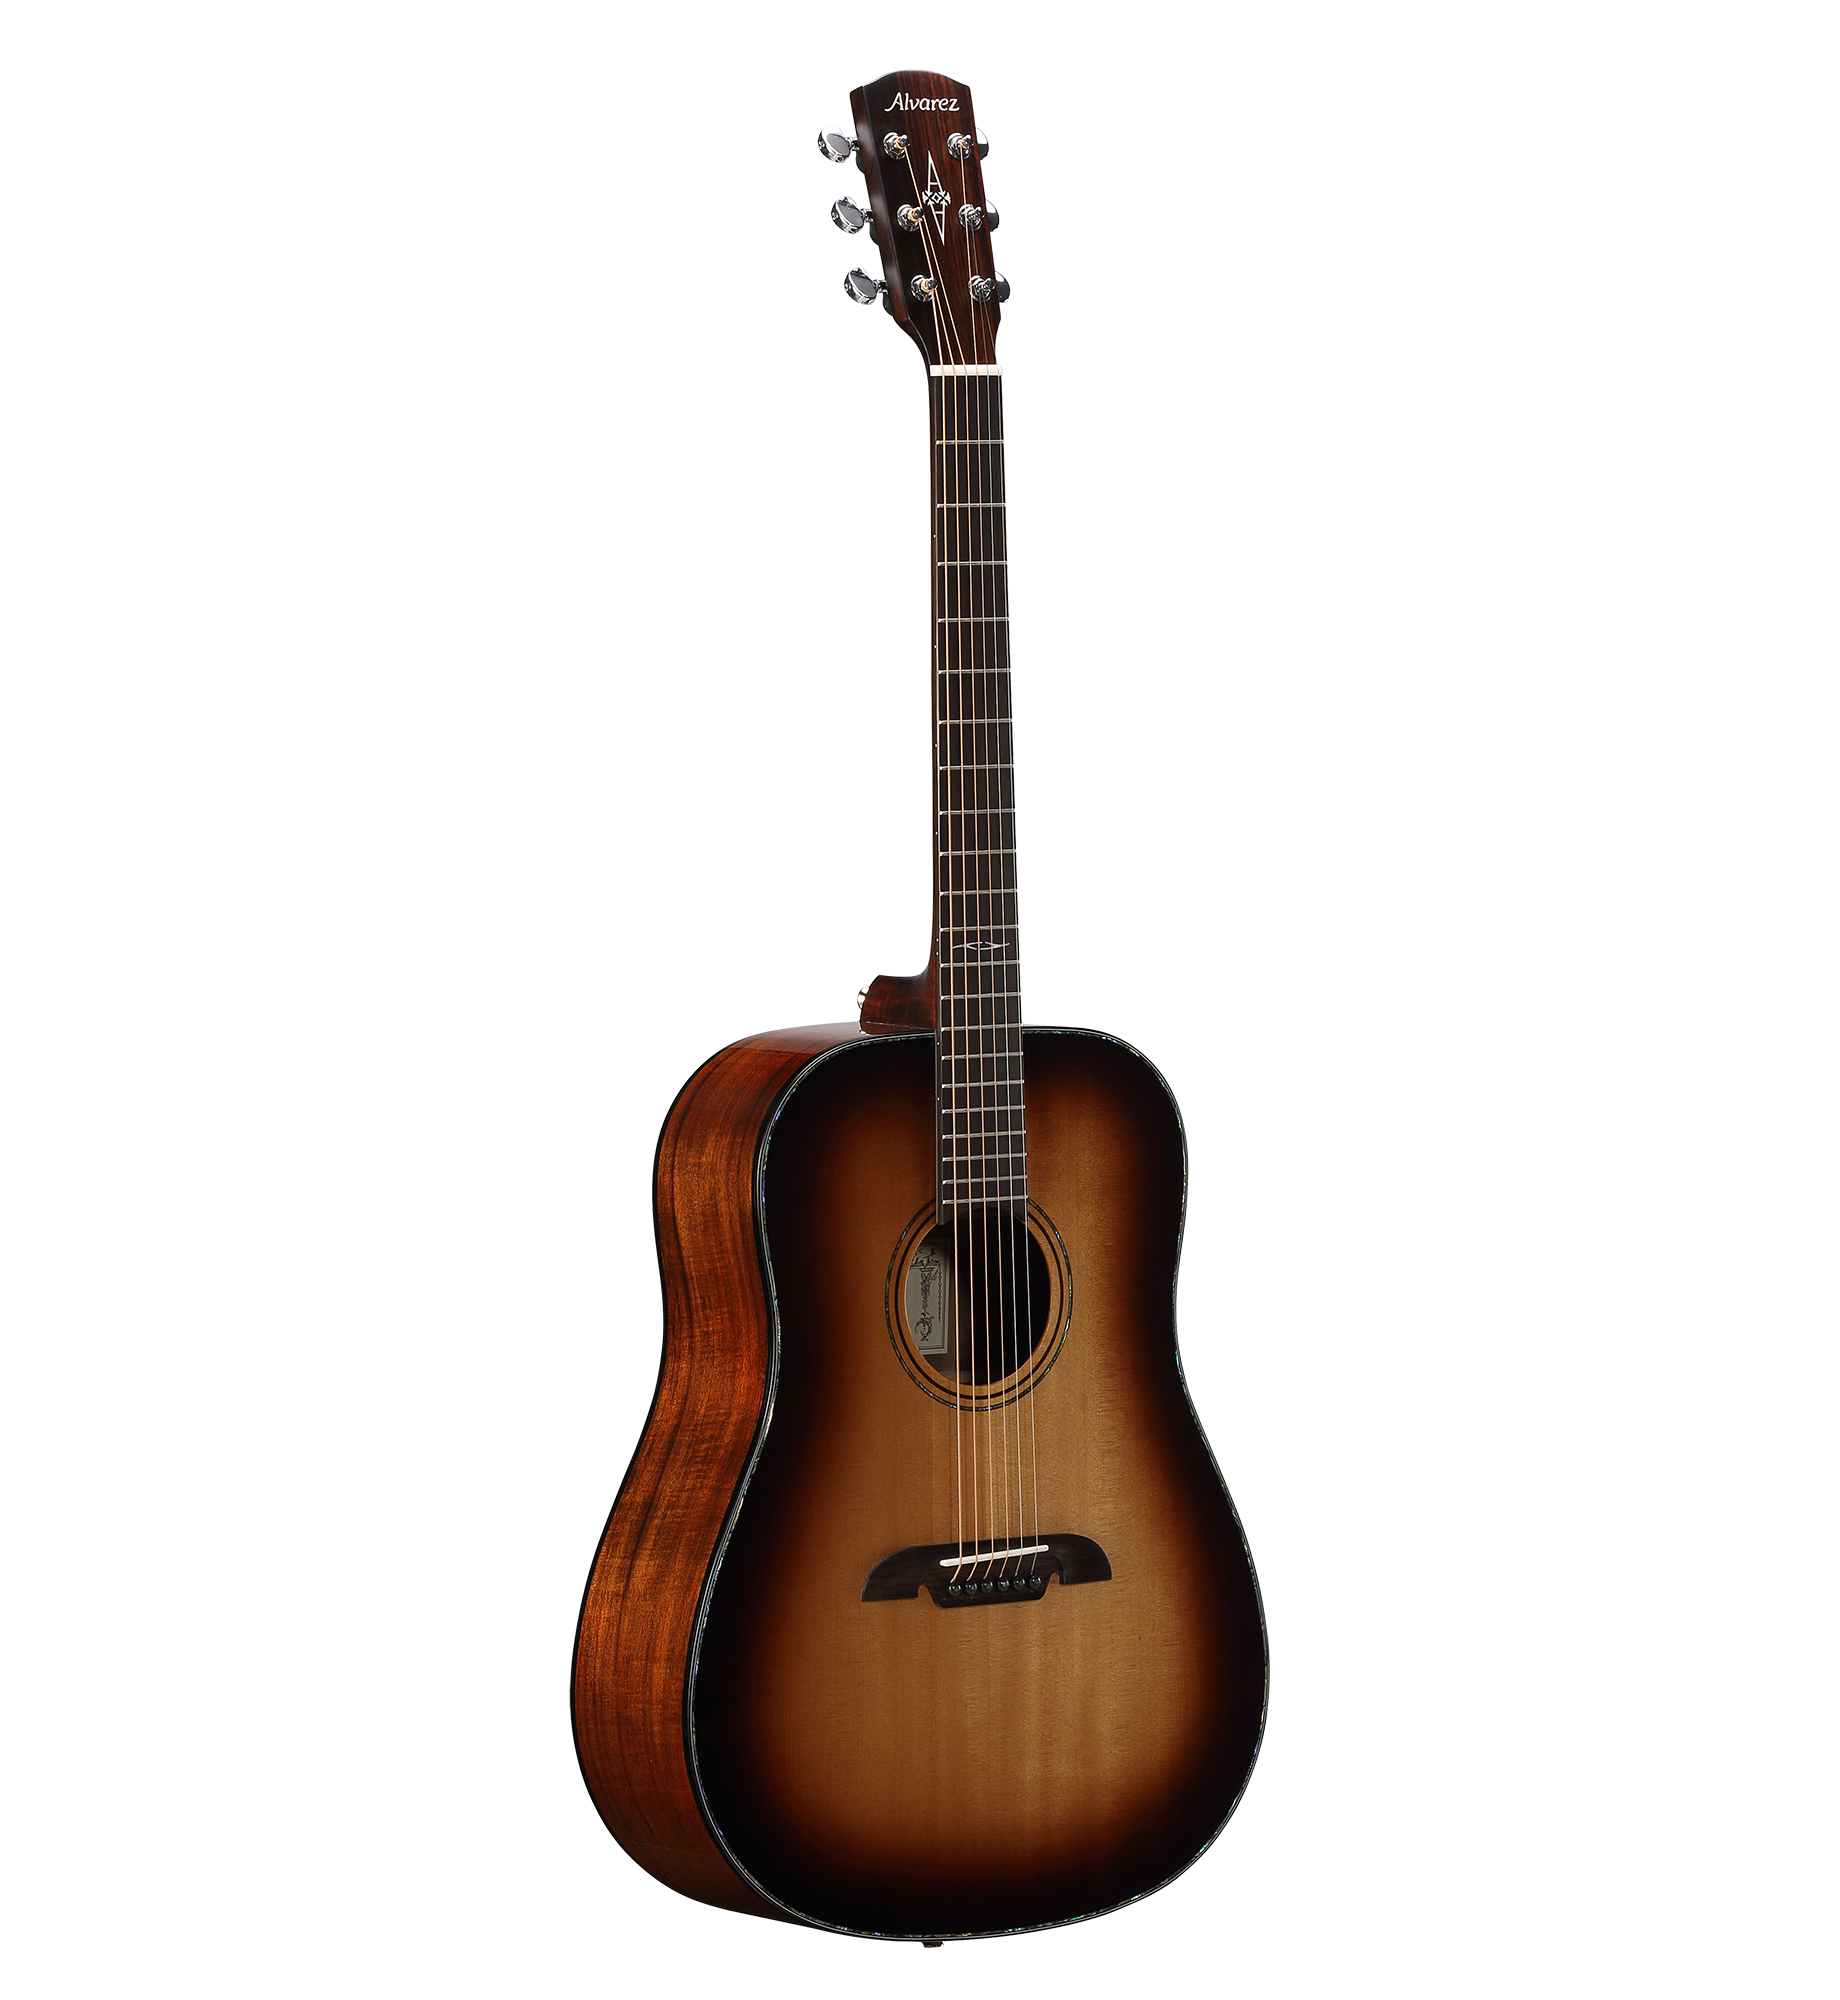 Alvarez ADA1965 Grand Dreadnought Anniversary akustinė gitara